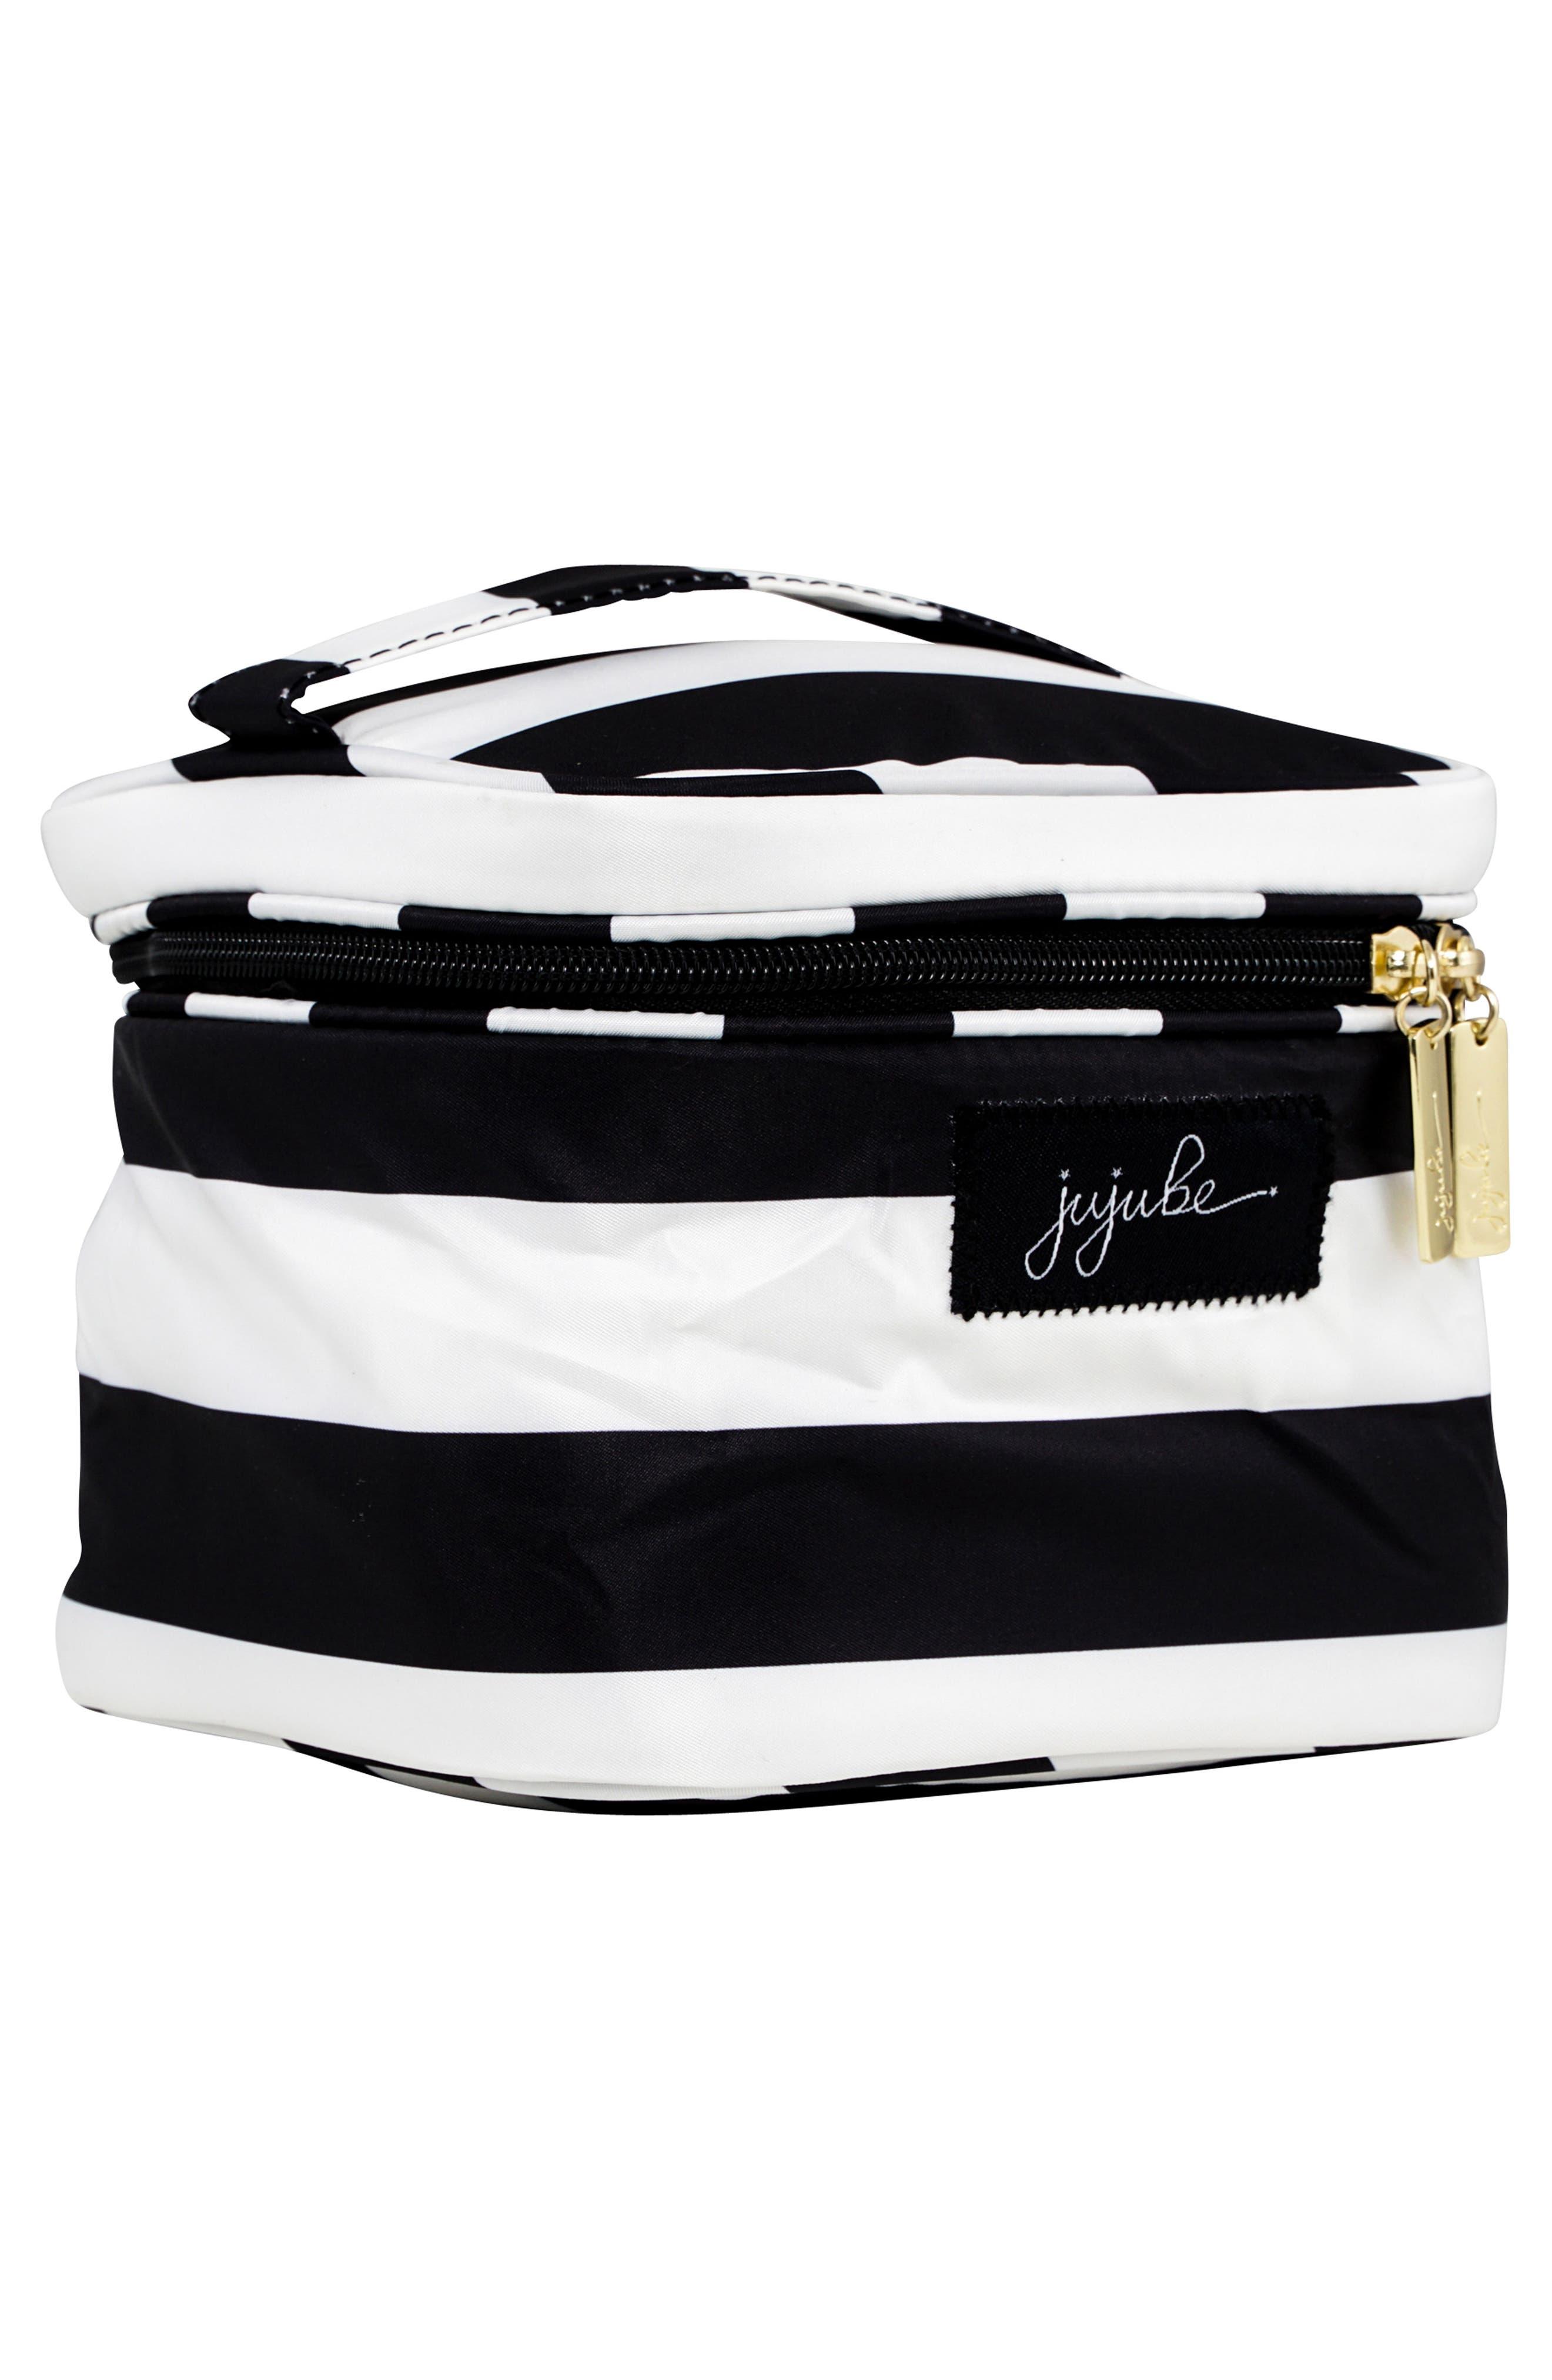 Alternate Image 7  - Ju-Ju-Be Legacy Be Equipped Pumping Bag Set